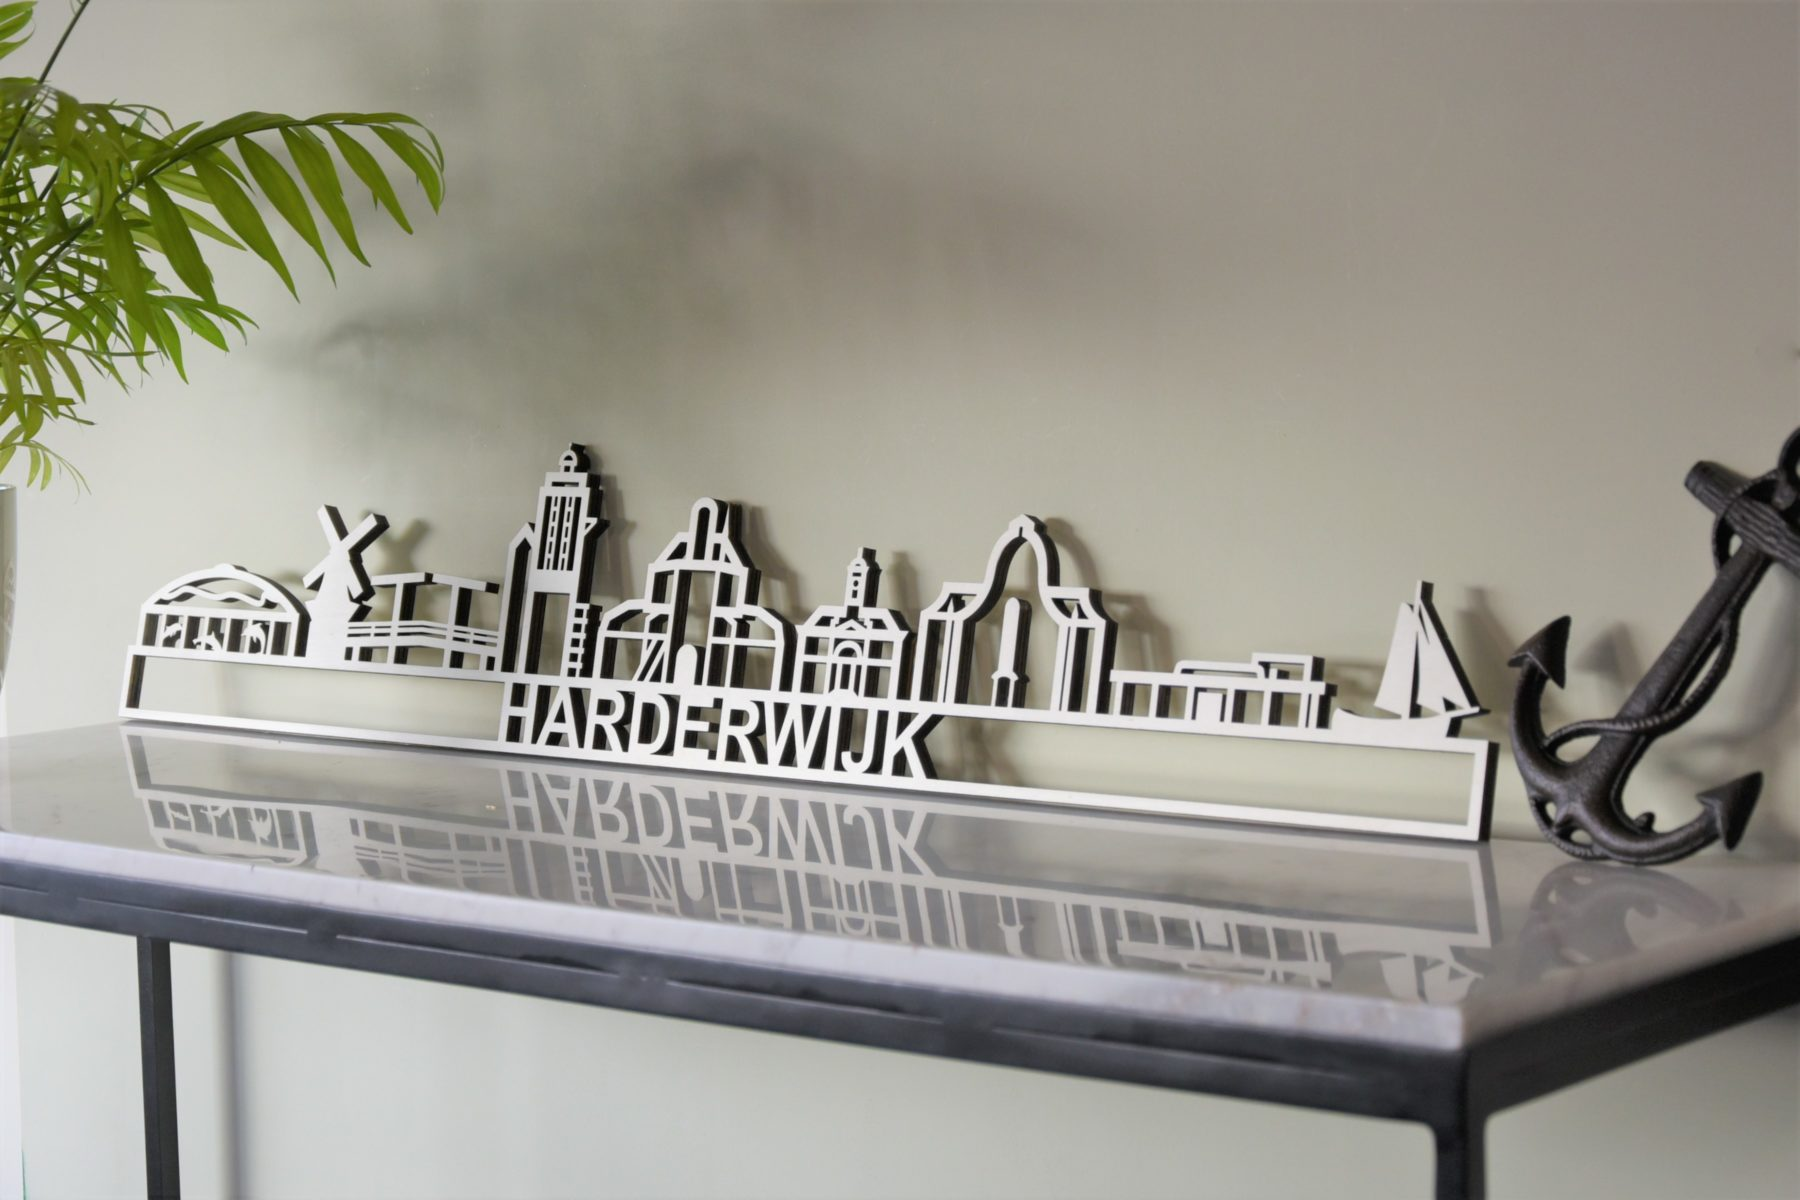 Skyline Harderwijk populierenhout